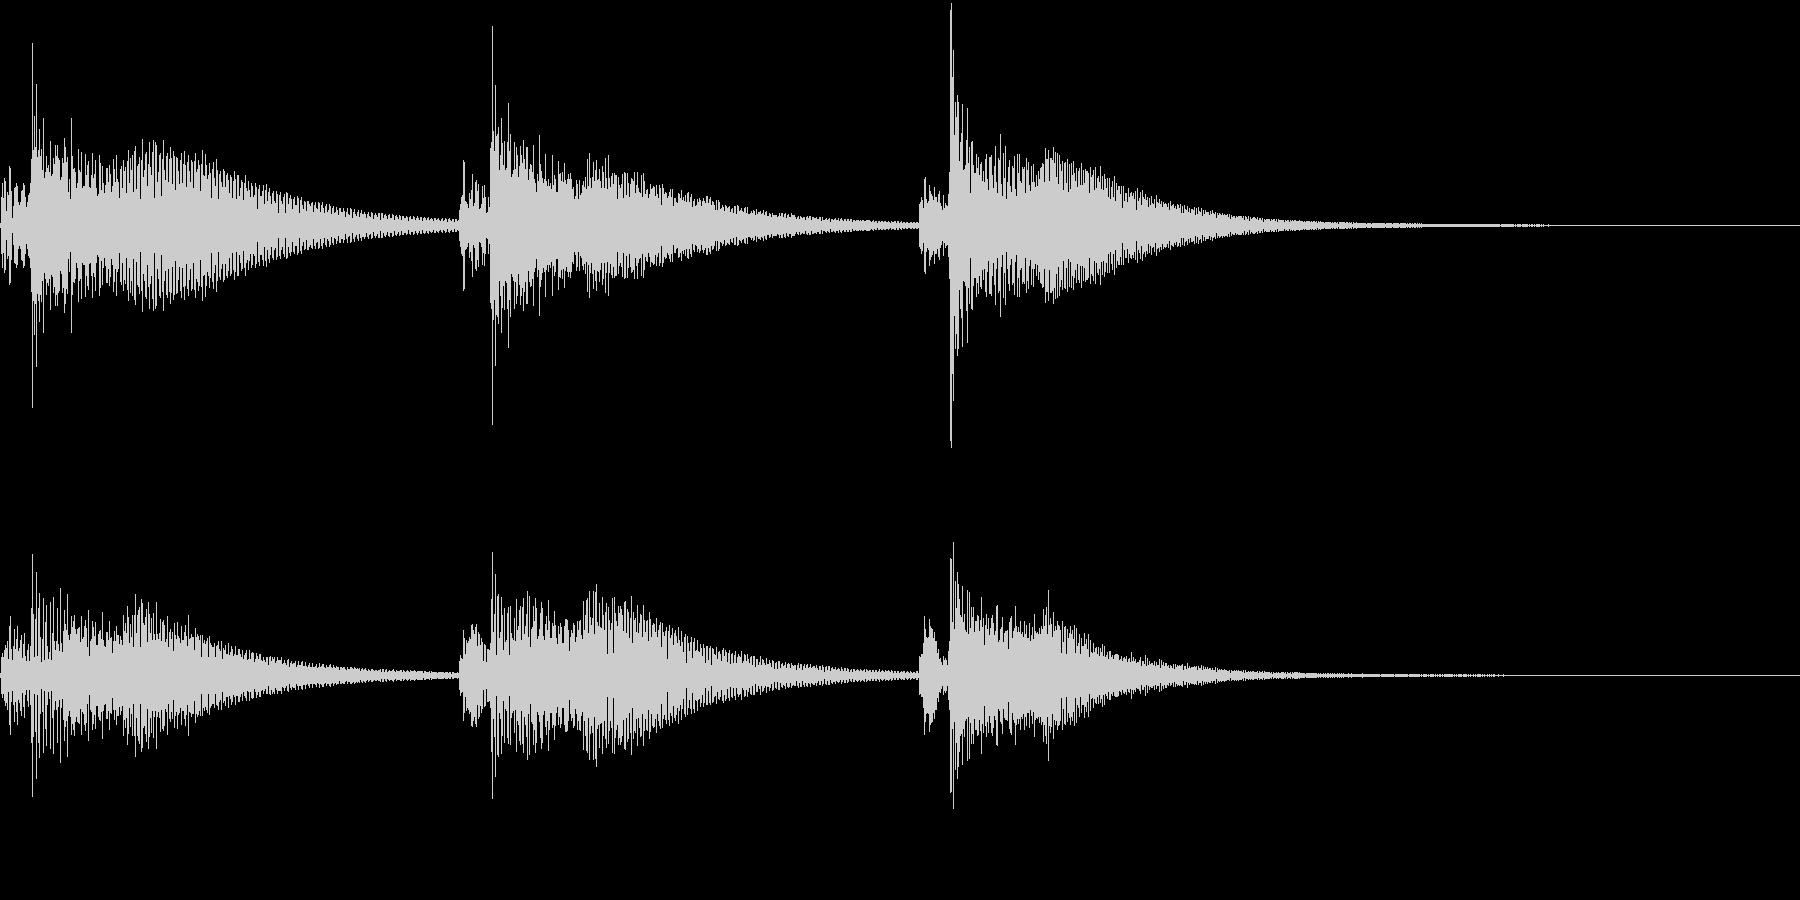 Kawaii メルヘンな受信・通知音 1の未再生の波形